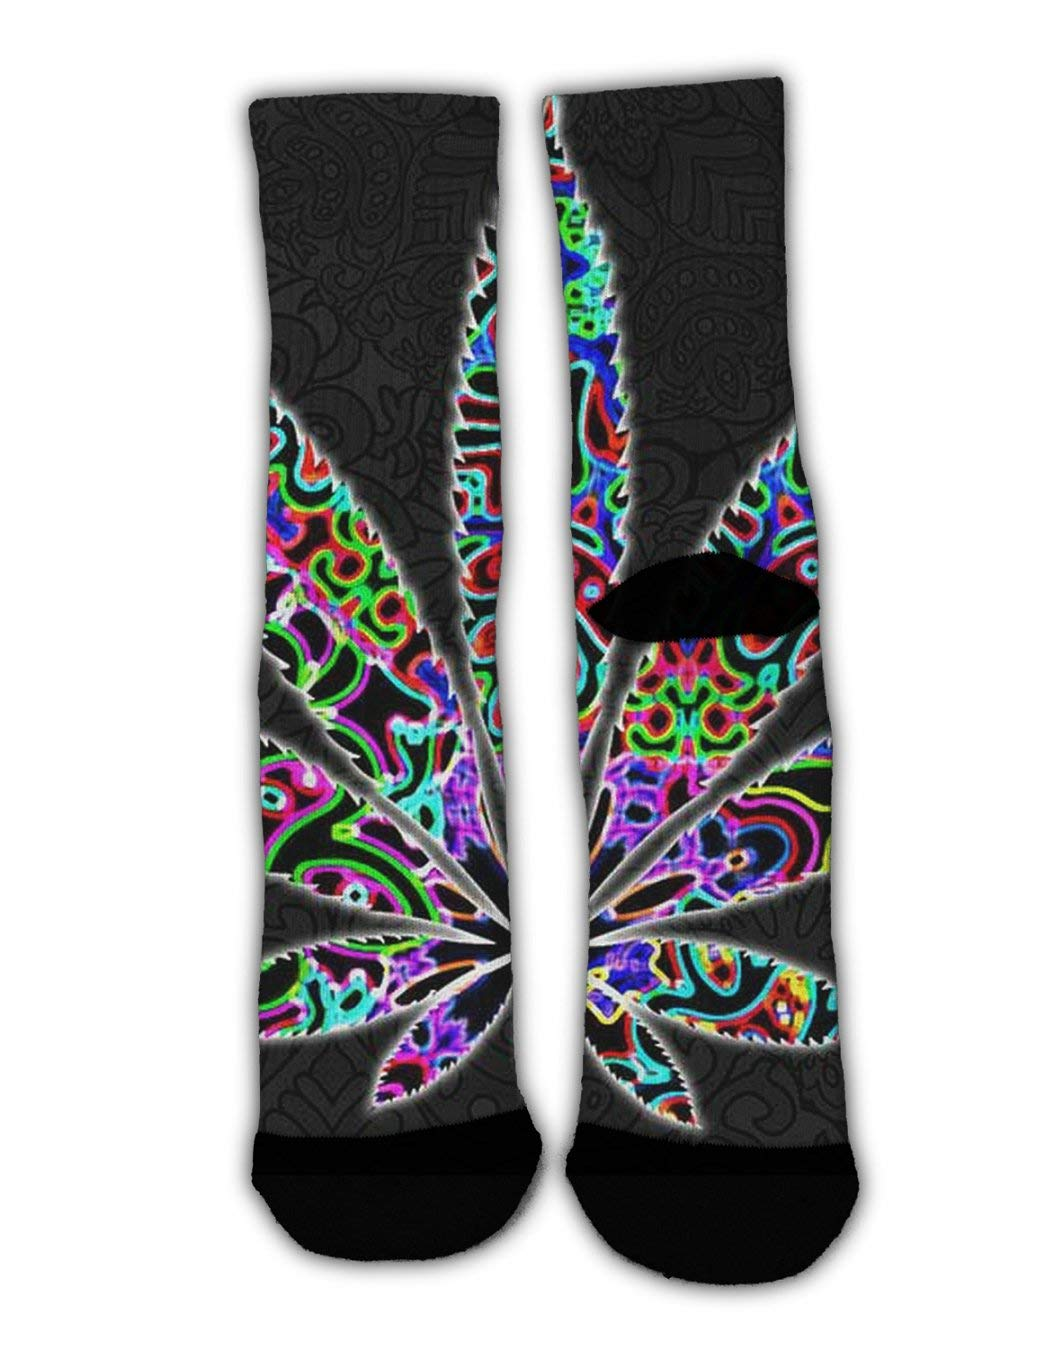 YEAHSPACE Kids Boys Girls Marijuana Weed Leaf Colorful Funky Dress Socks Fashion Cotton Crew Socks Holiday Socks Warm Winter Socks for Christmas New Year